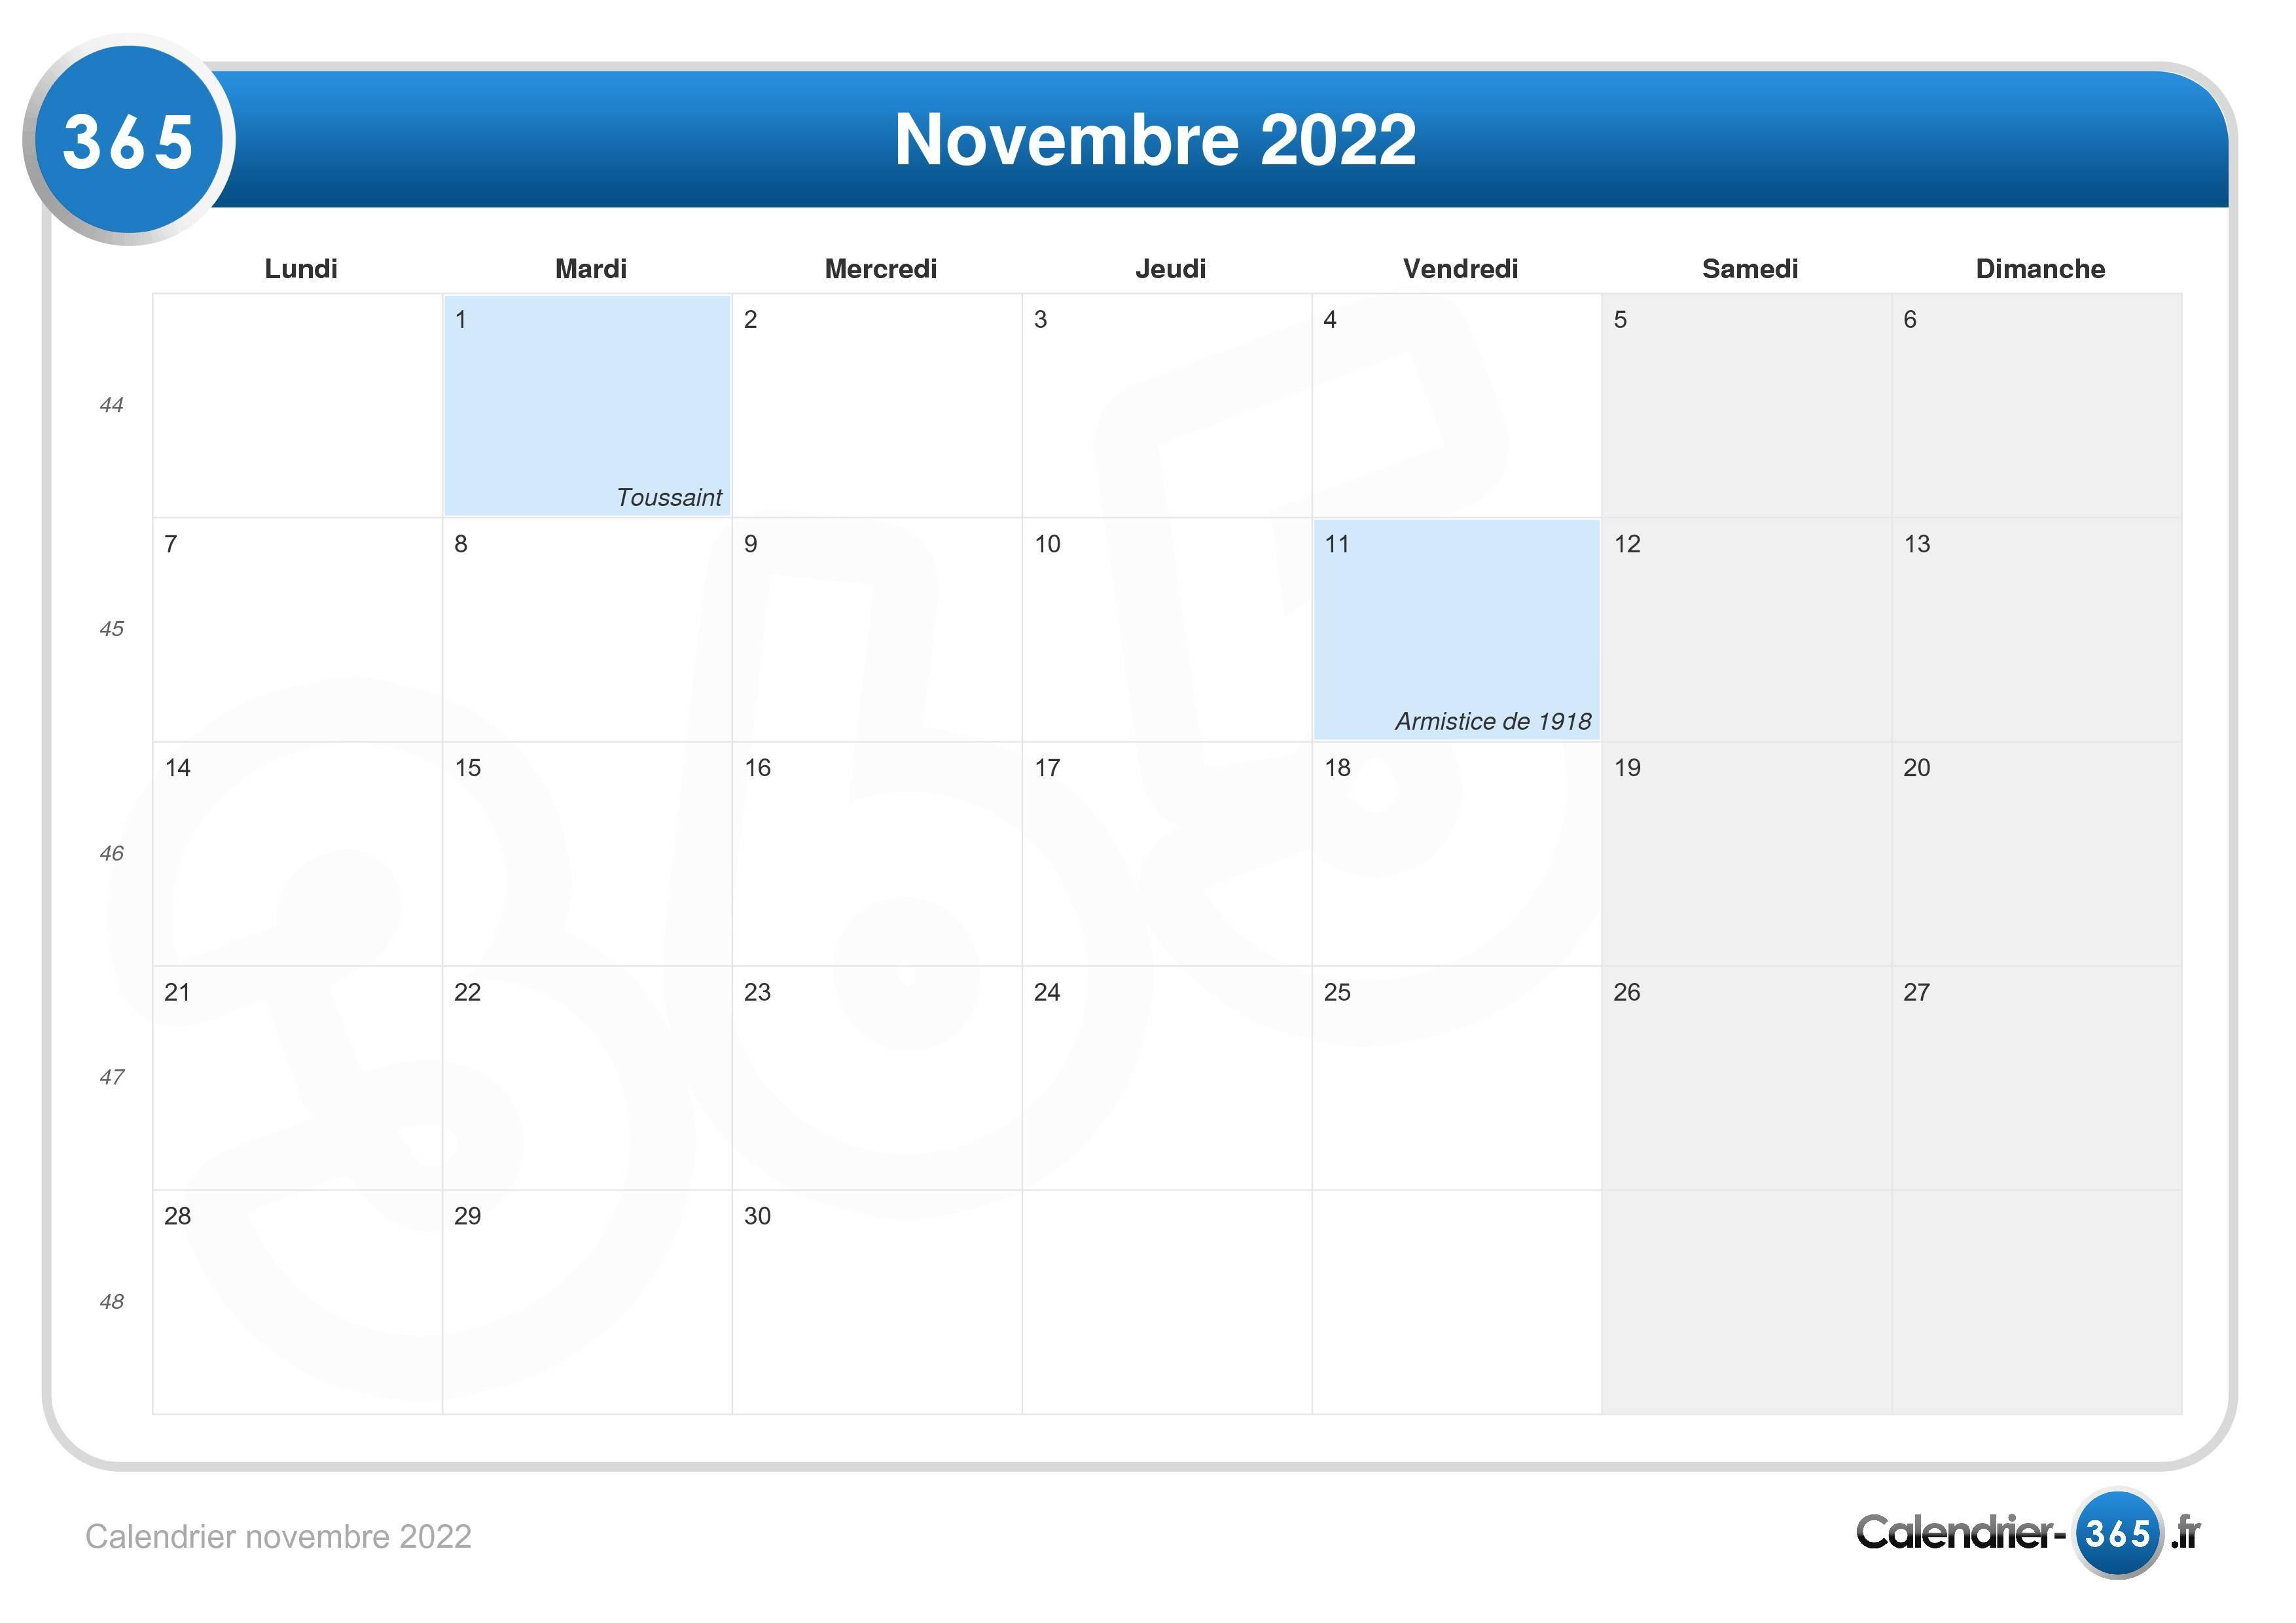 Calendrier 2022 Novembre Calendrier novembre 2022